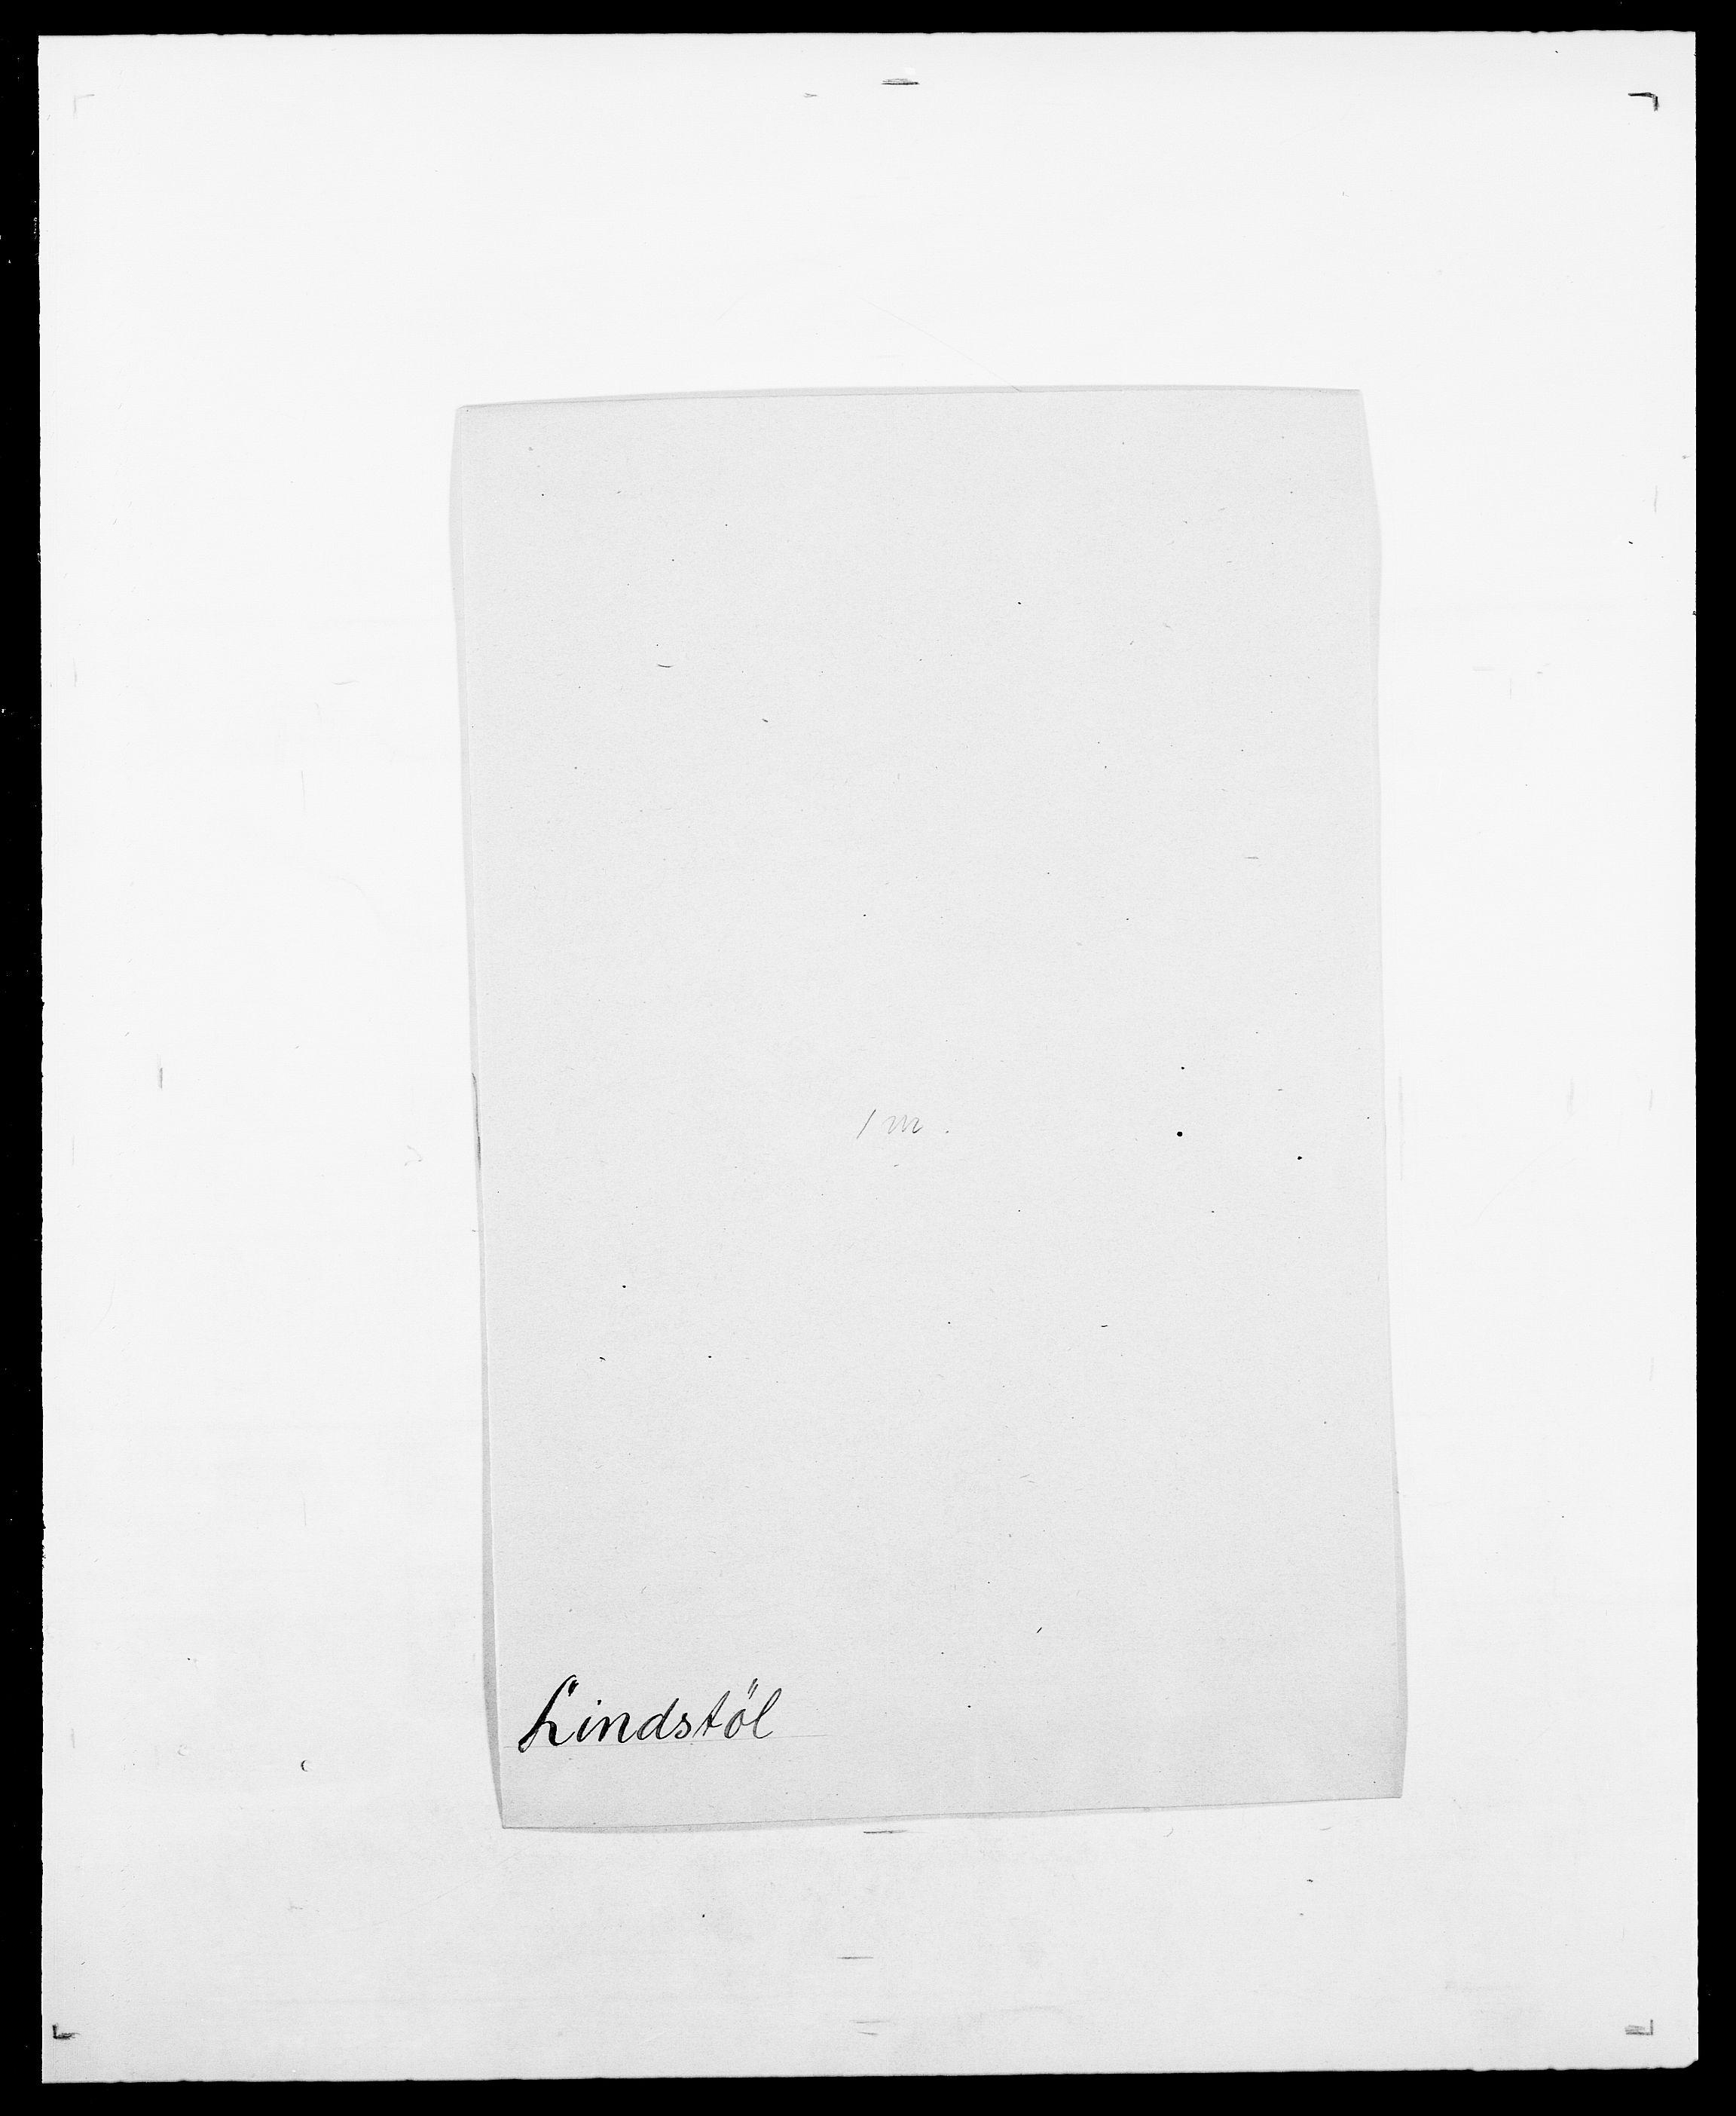 SAO, Delgobe, Charles Antoine - samling, D/Da/L0023: Lau - Lirvyn, s. 628